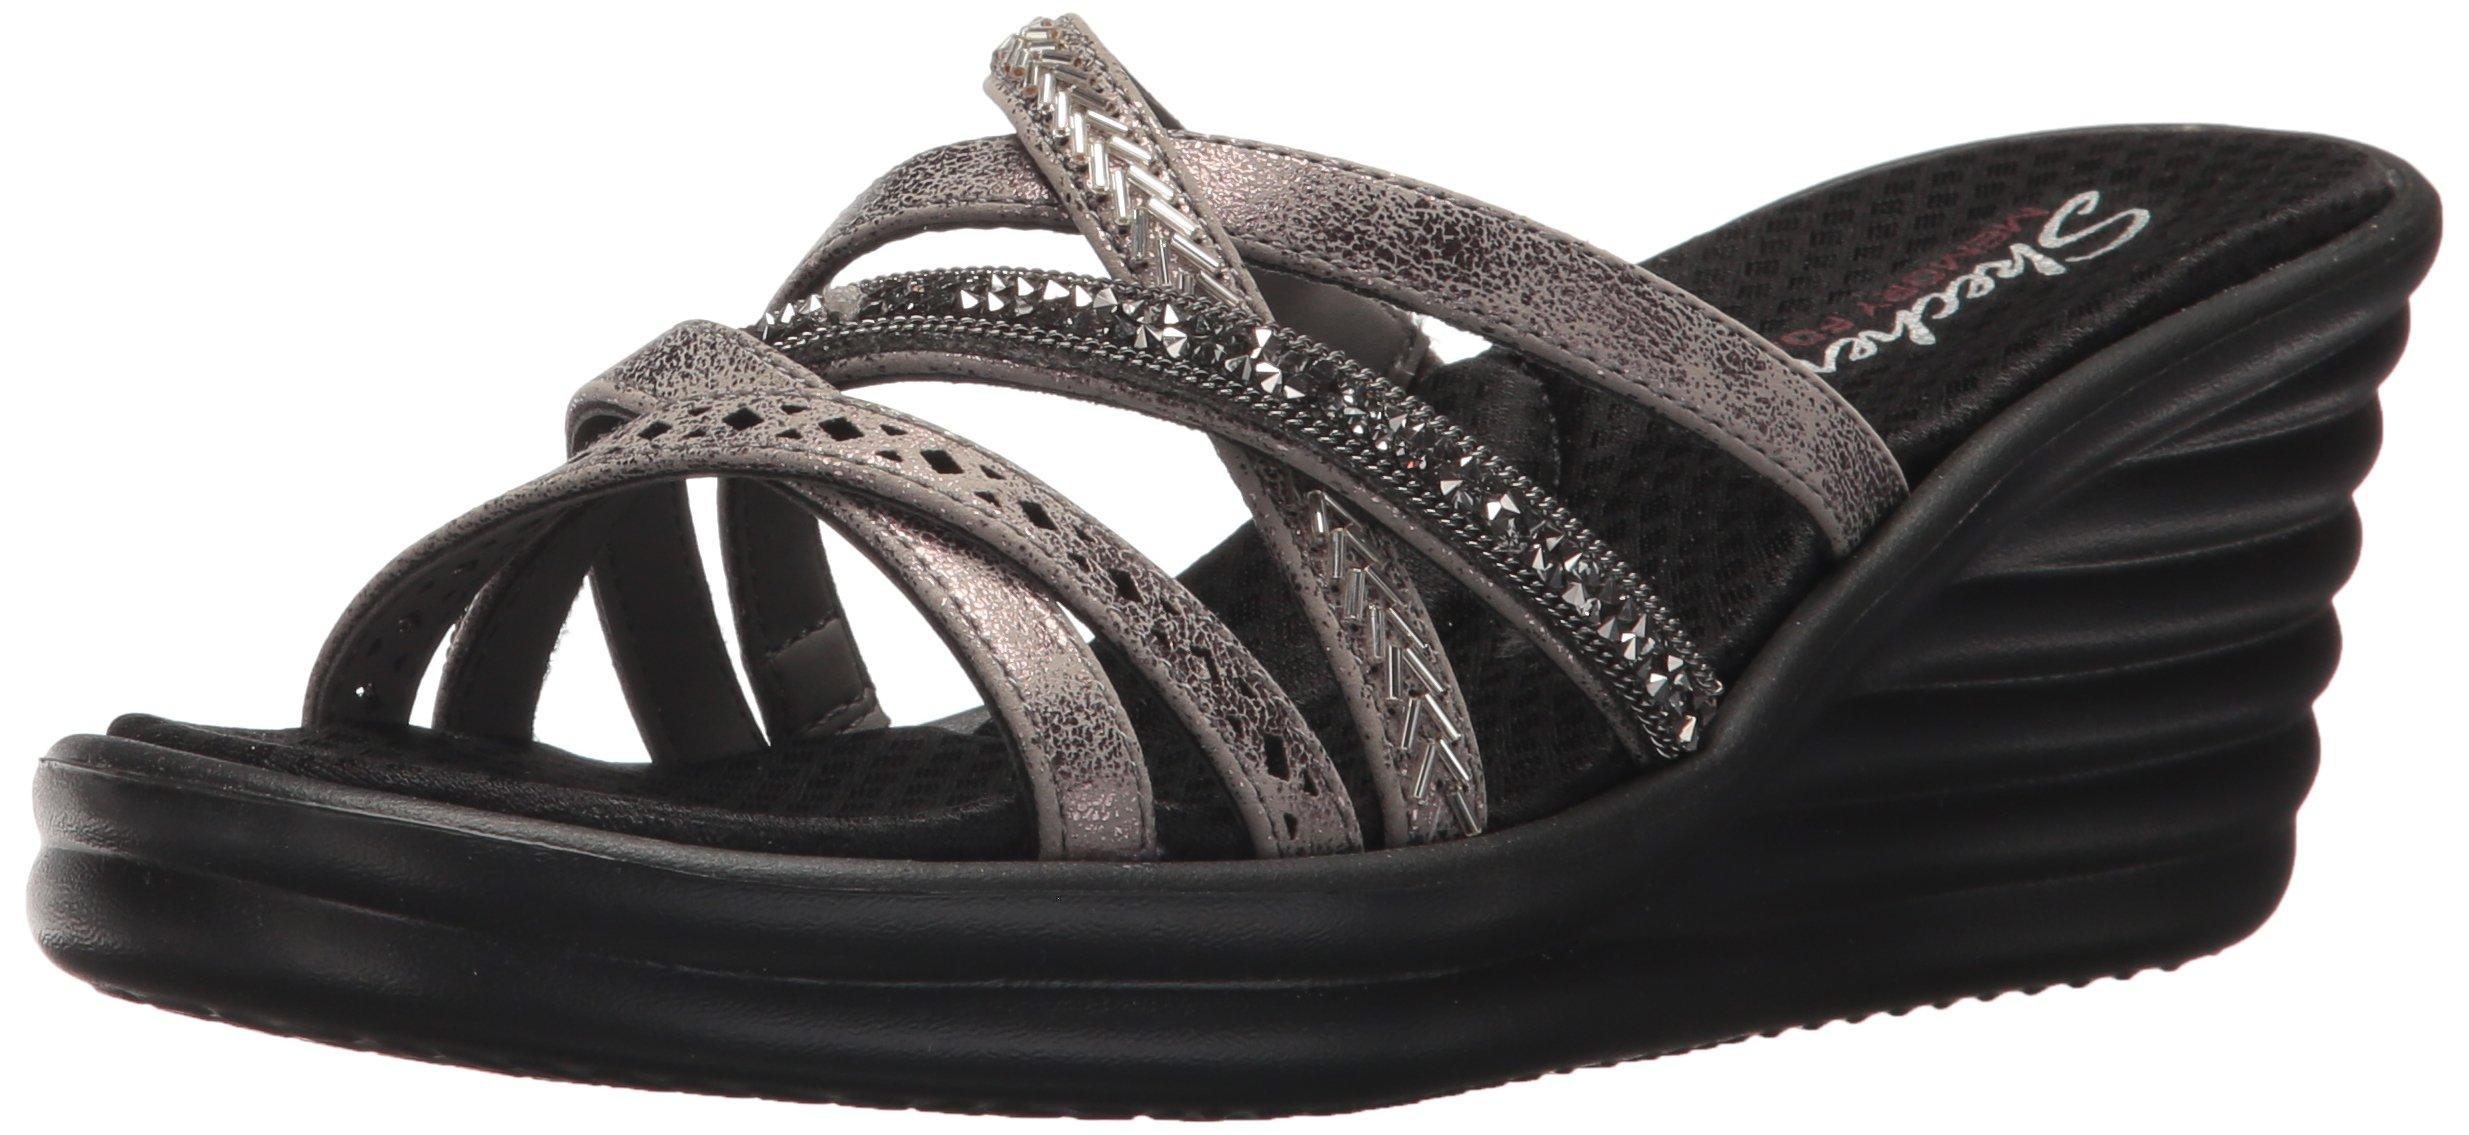 74034ad1bbe Skechers Cali Women s Rumbler Wave-New Lassie Slide Sandal